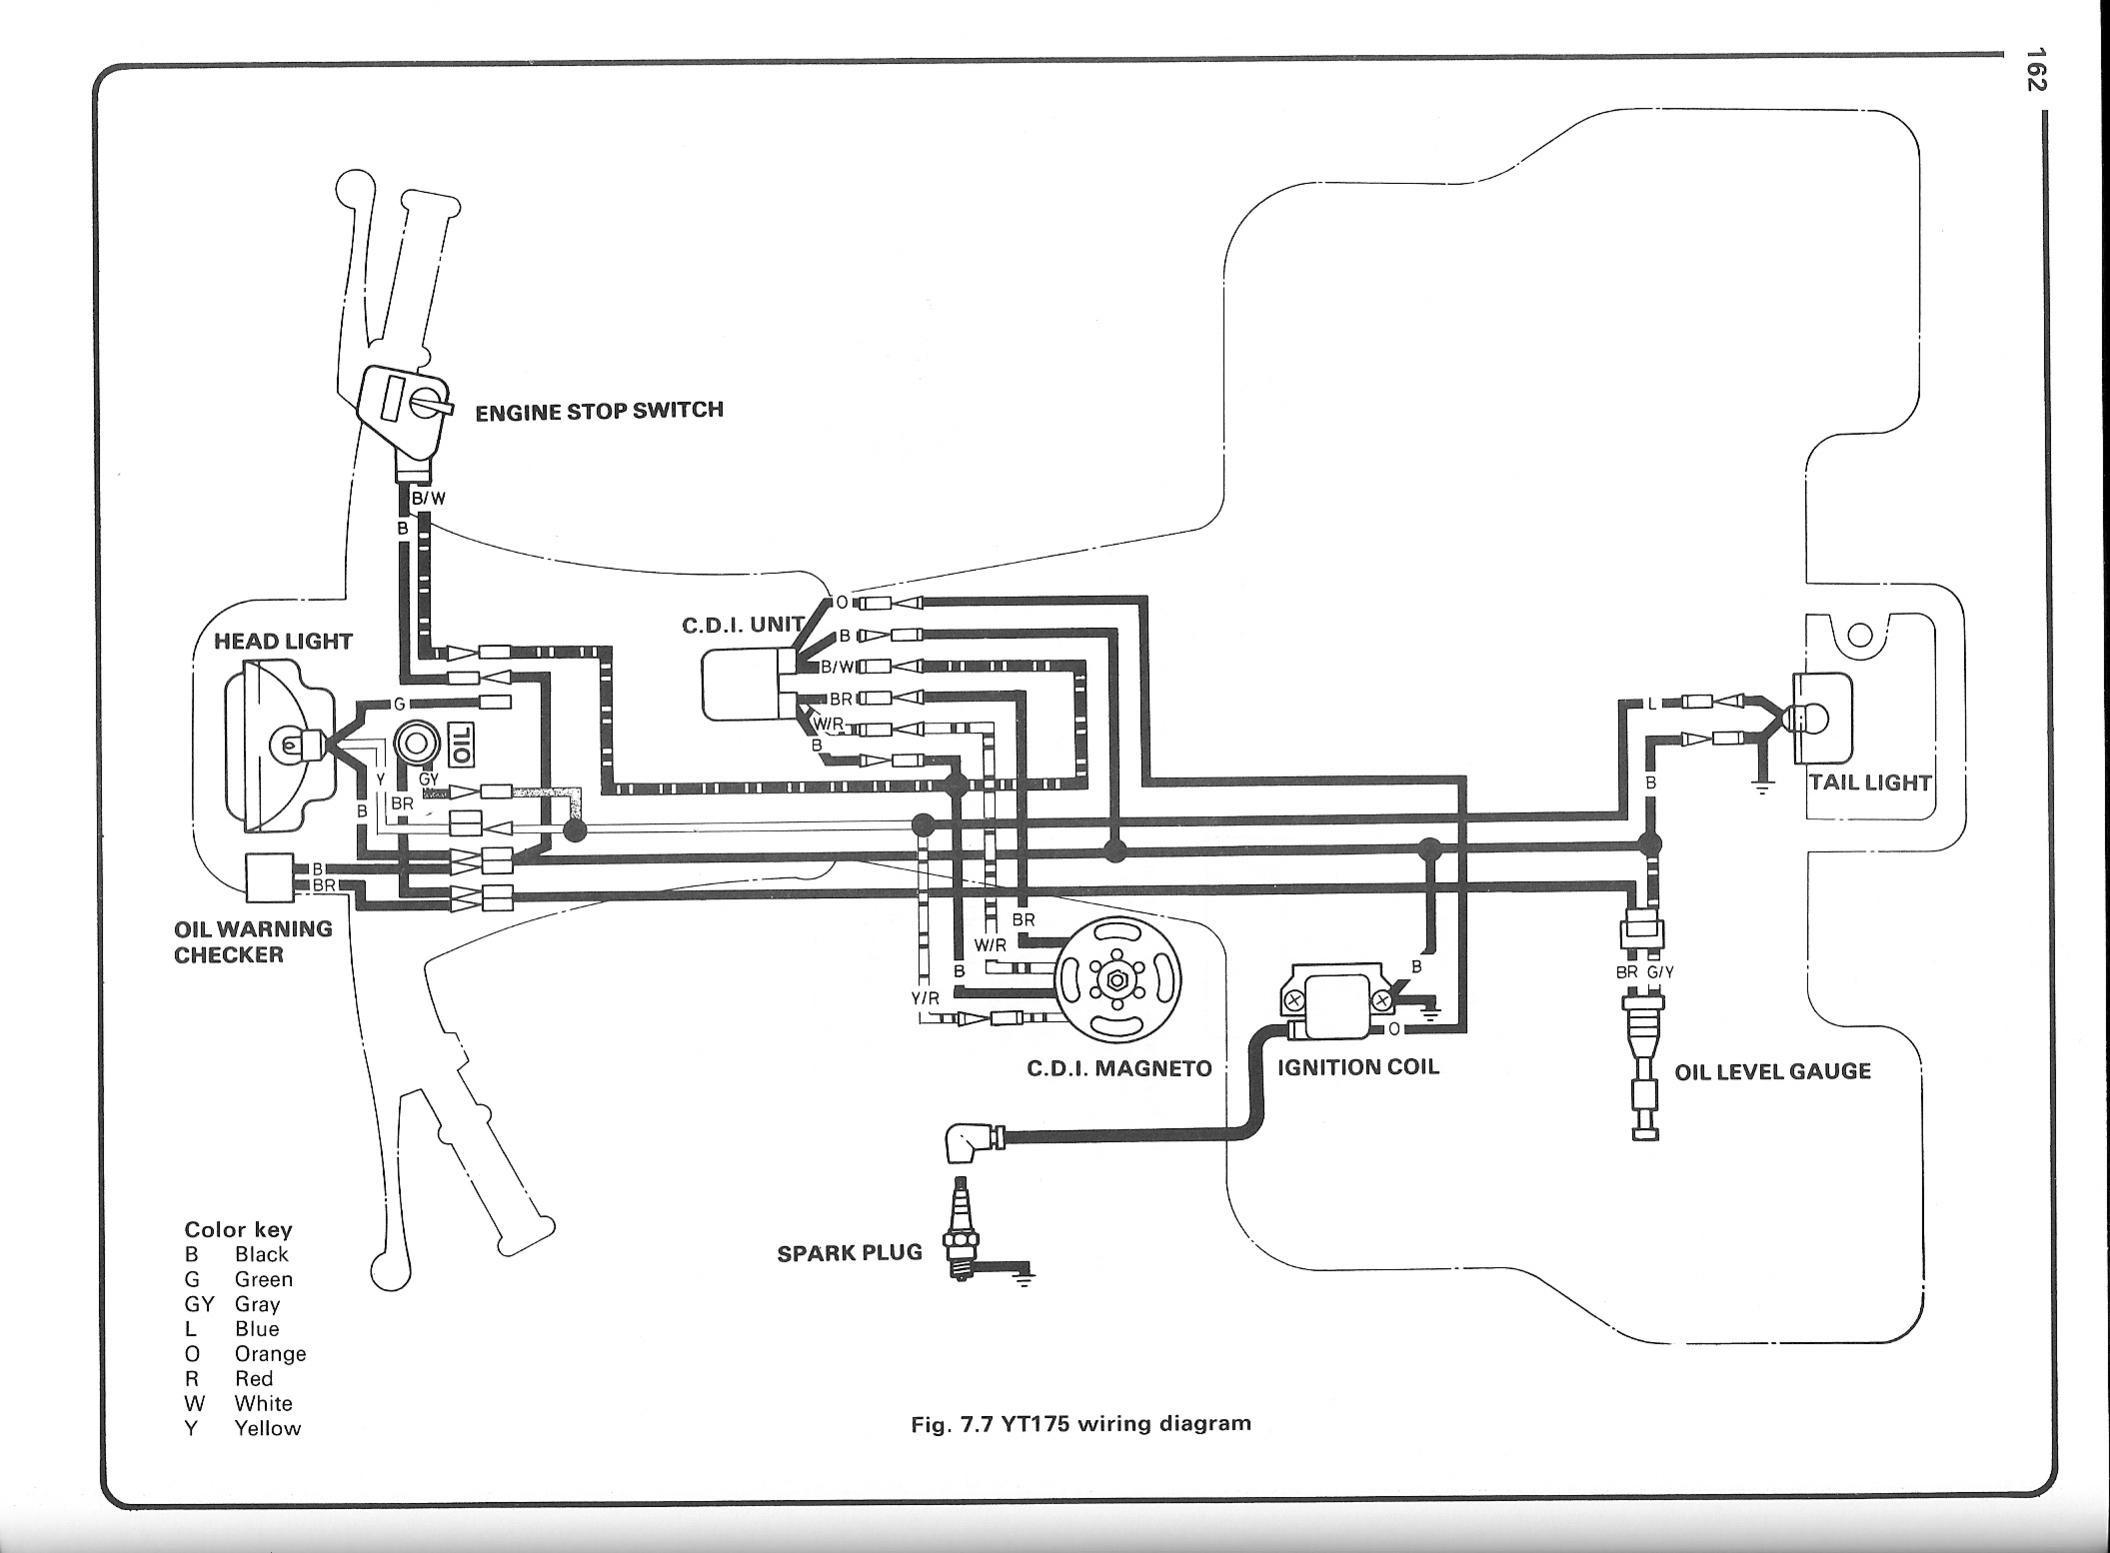 Yamaha Waveblaster Wiring Diagram on exhaust mount, aftermarket exhaust, jet pump, water box,